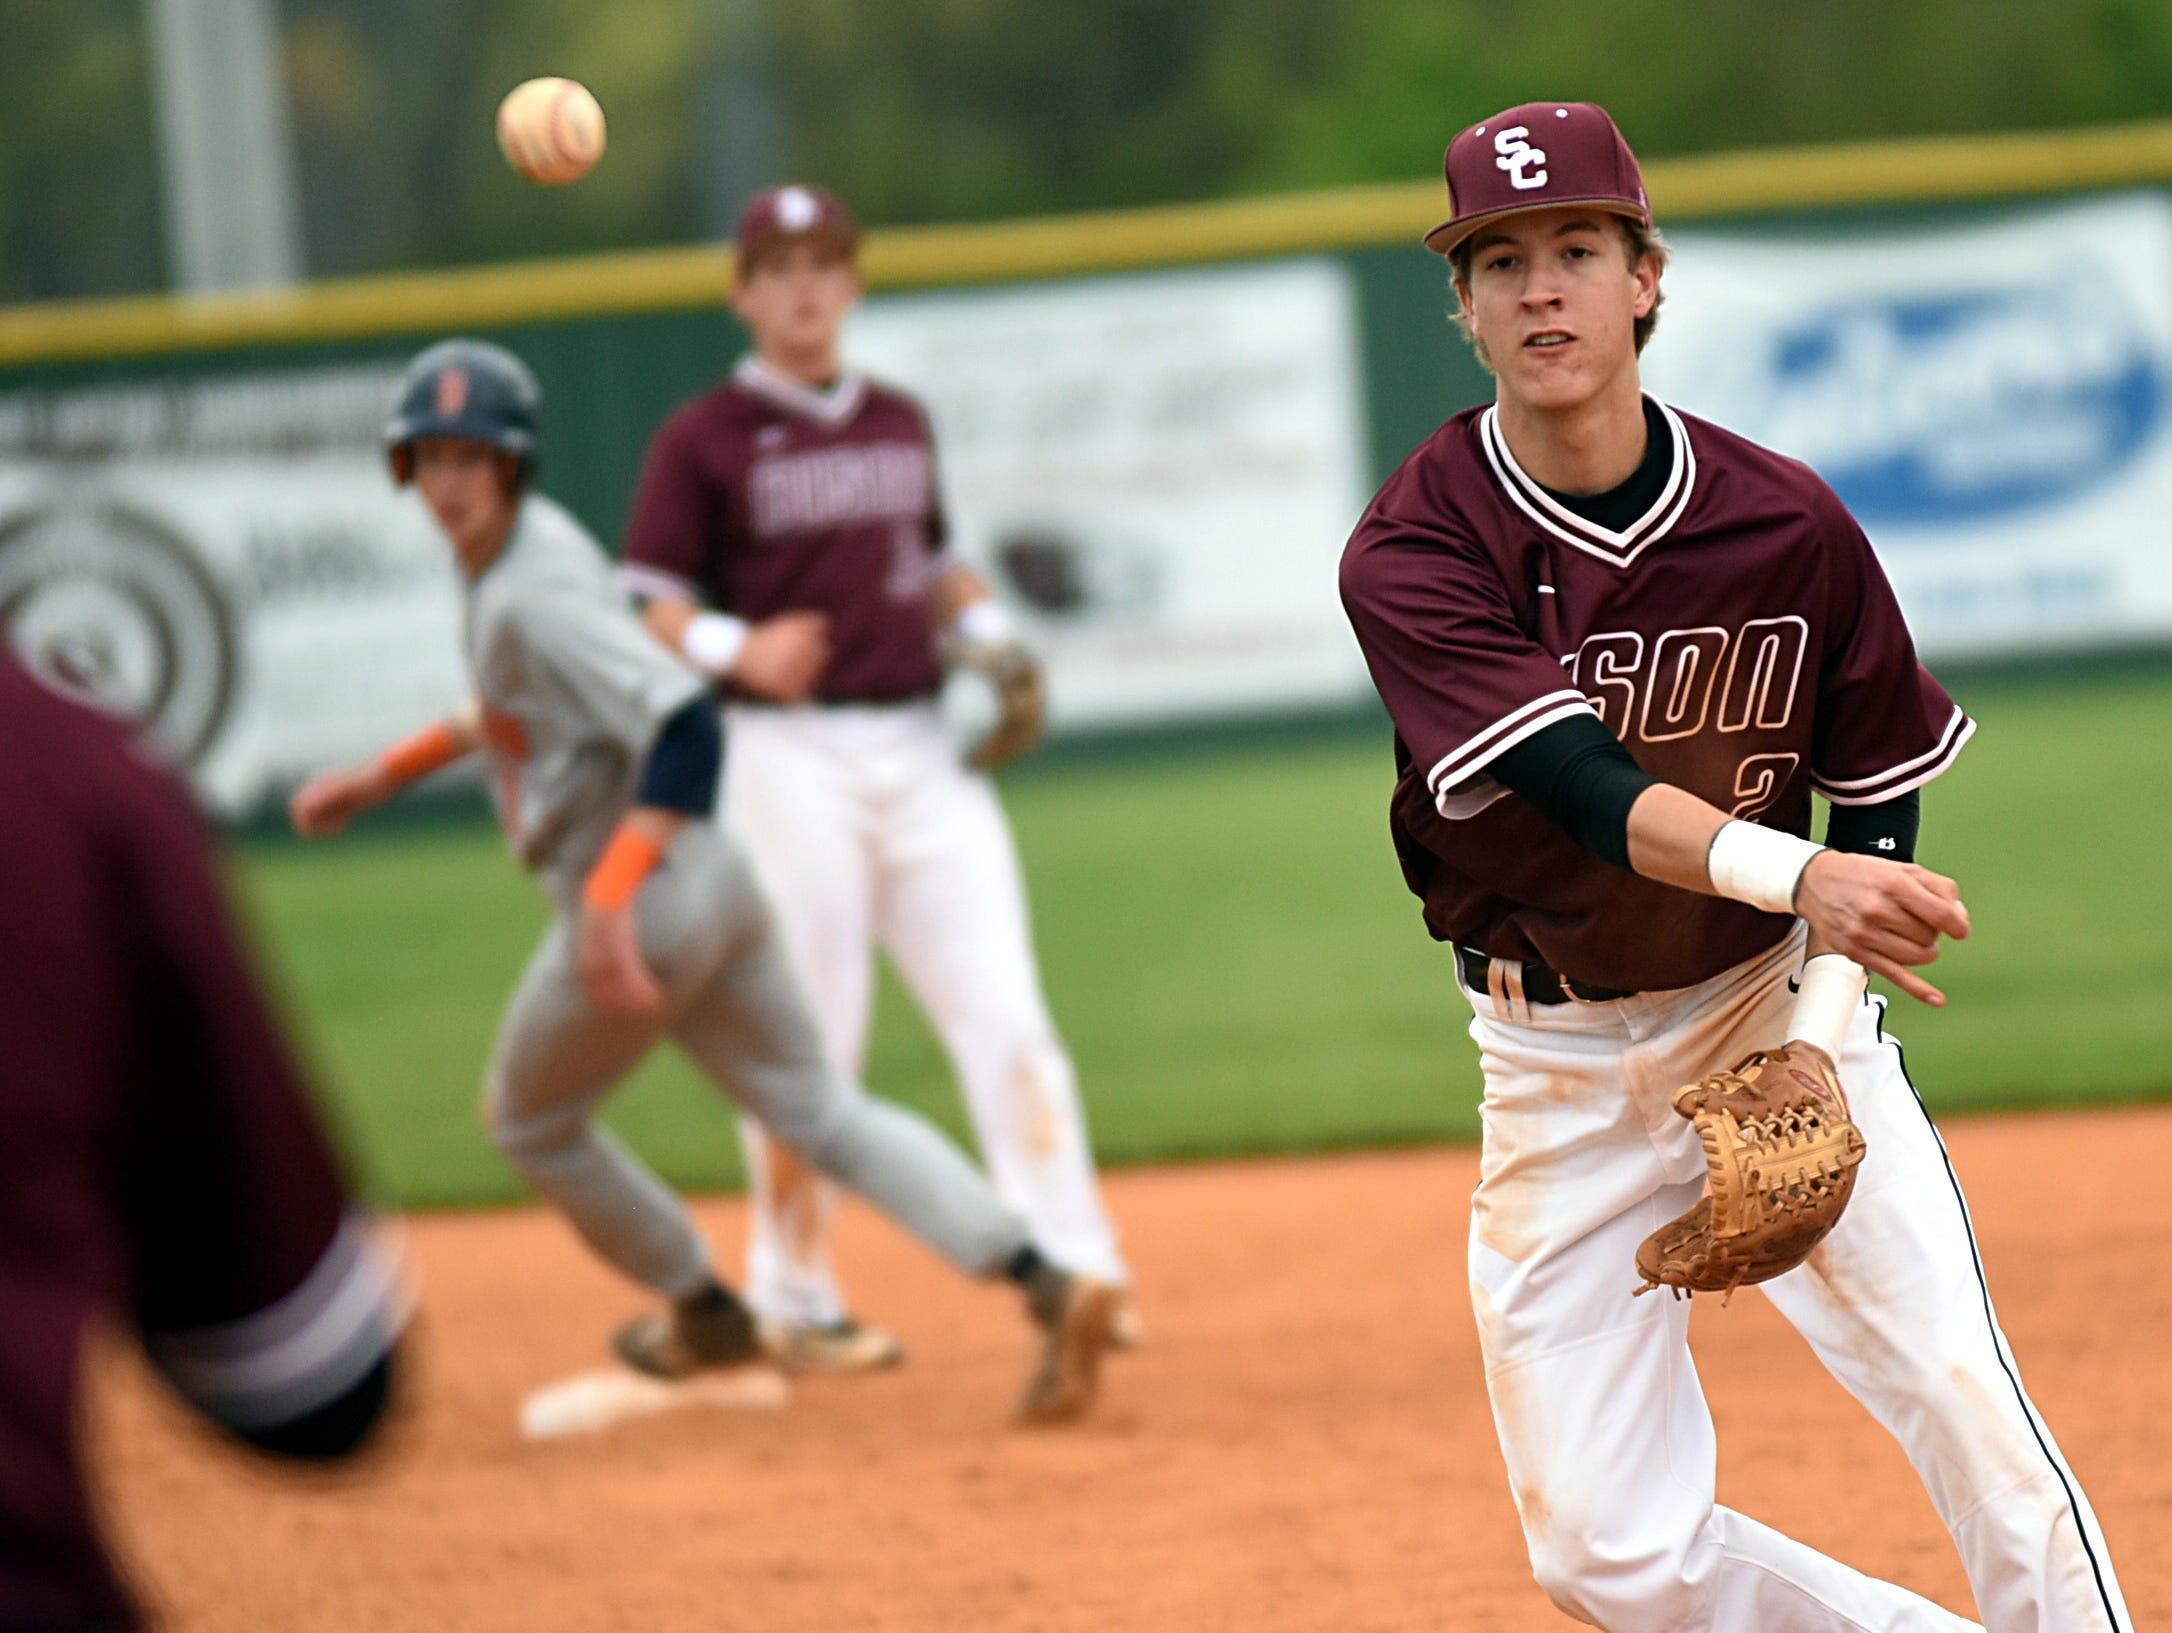 Station Camp High senior second baseman Blair Flatt throws to senior first baseman Lucas Gross for a seventh-inning putout